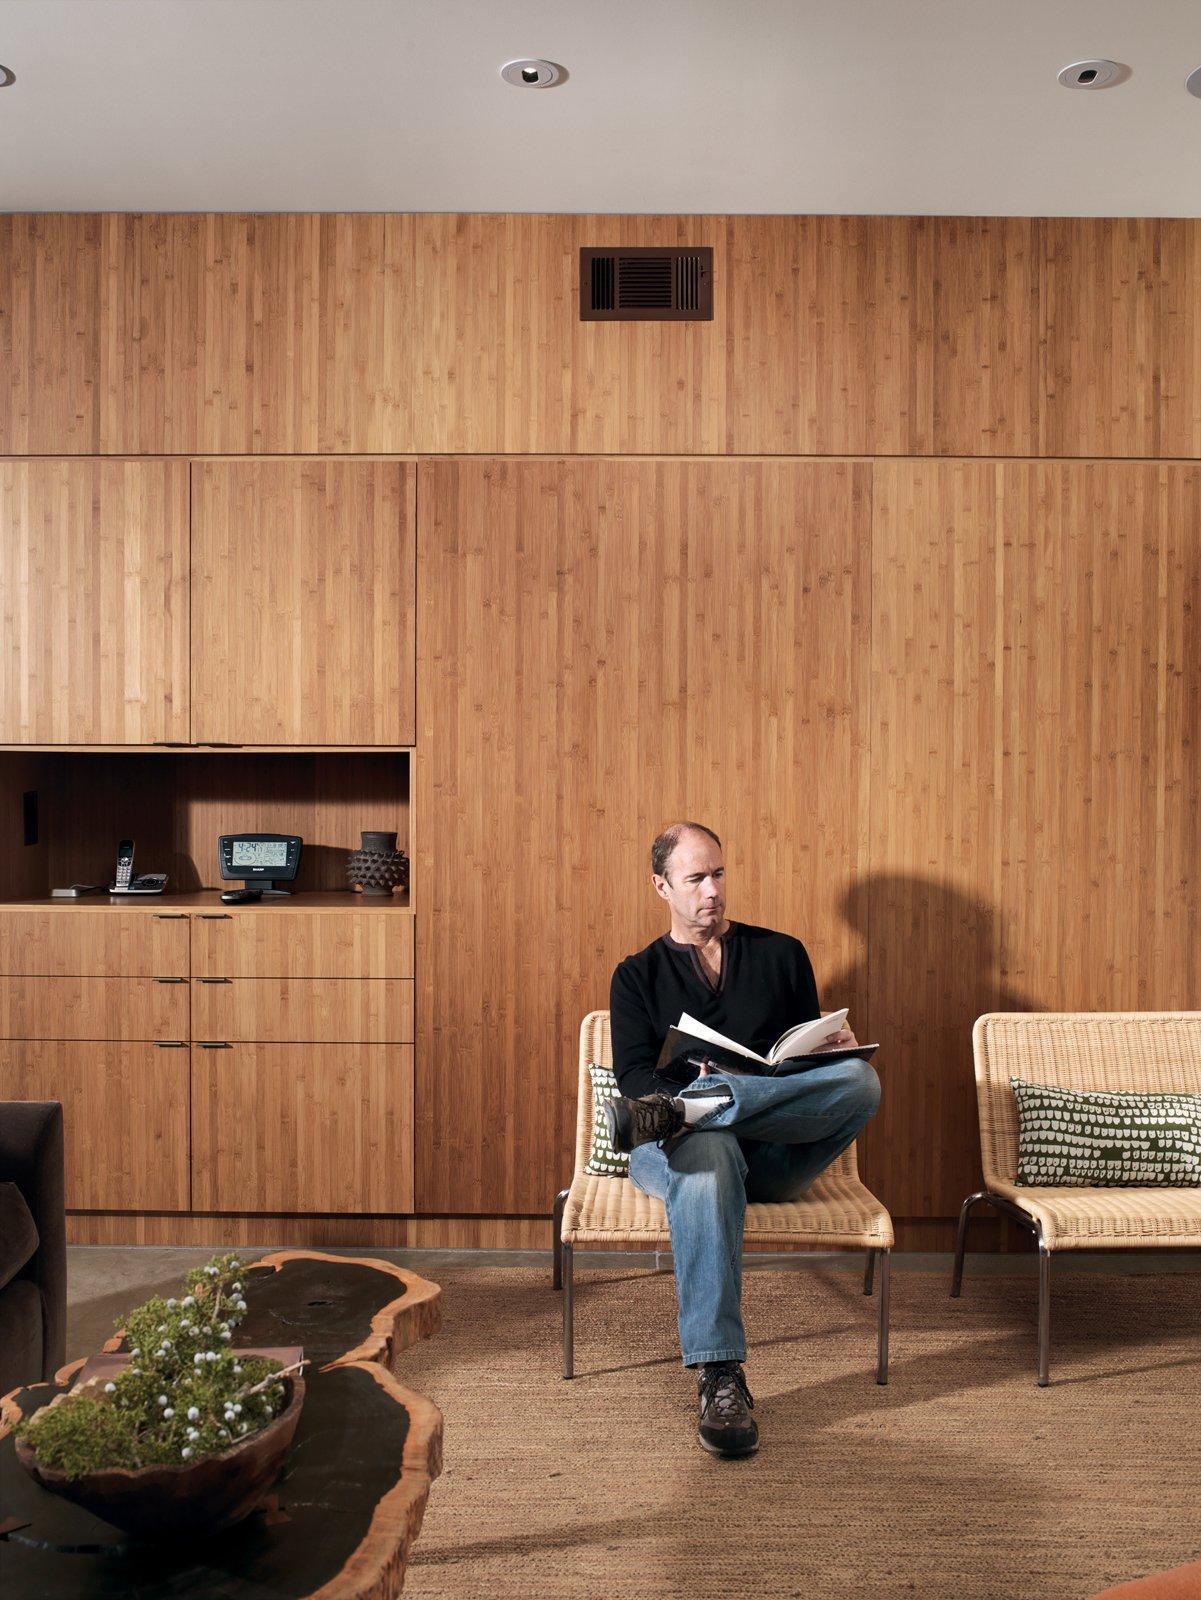 #seatingdesign #interior #inside #indoor #Plyboo #wall #coffeetable #livingroom #reading #wood  100+ Best Modern Seating Designs